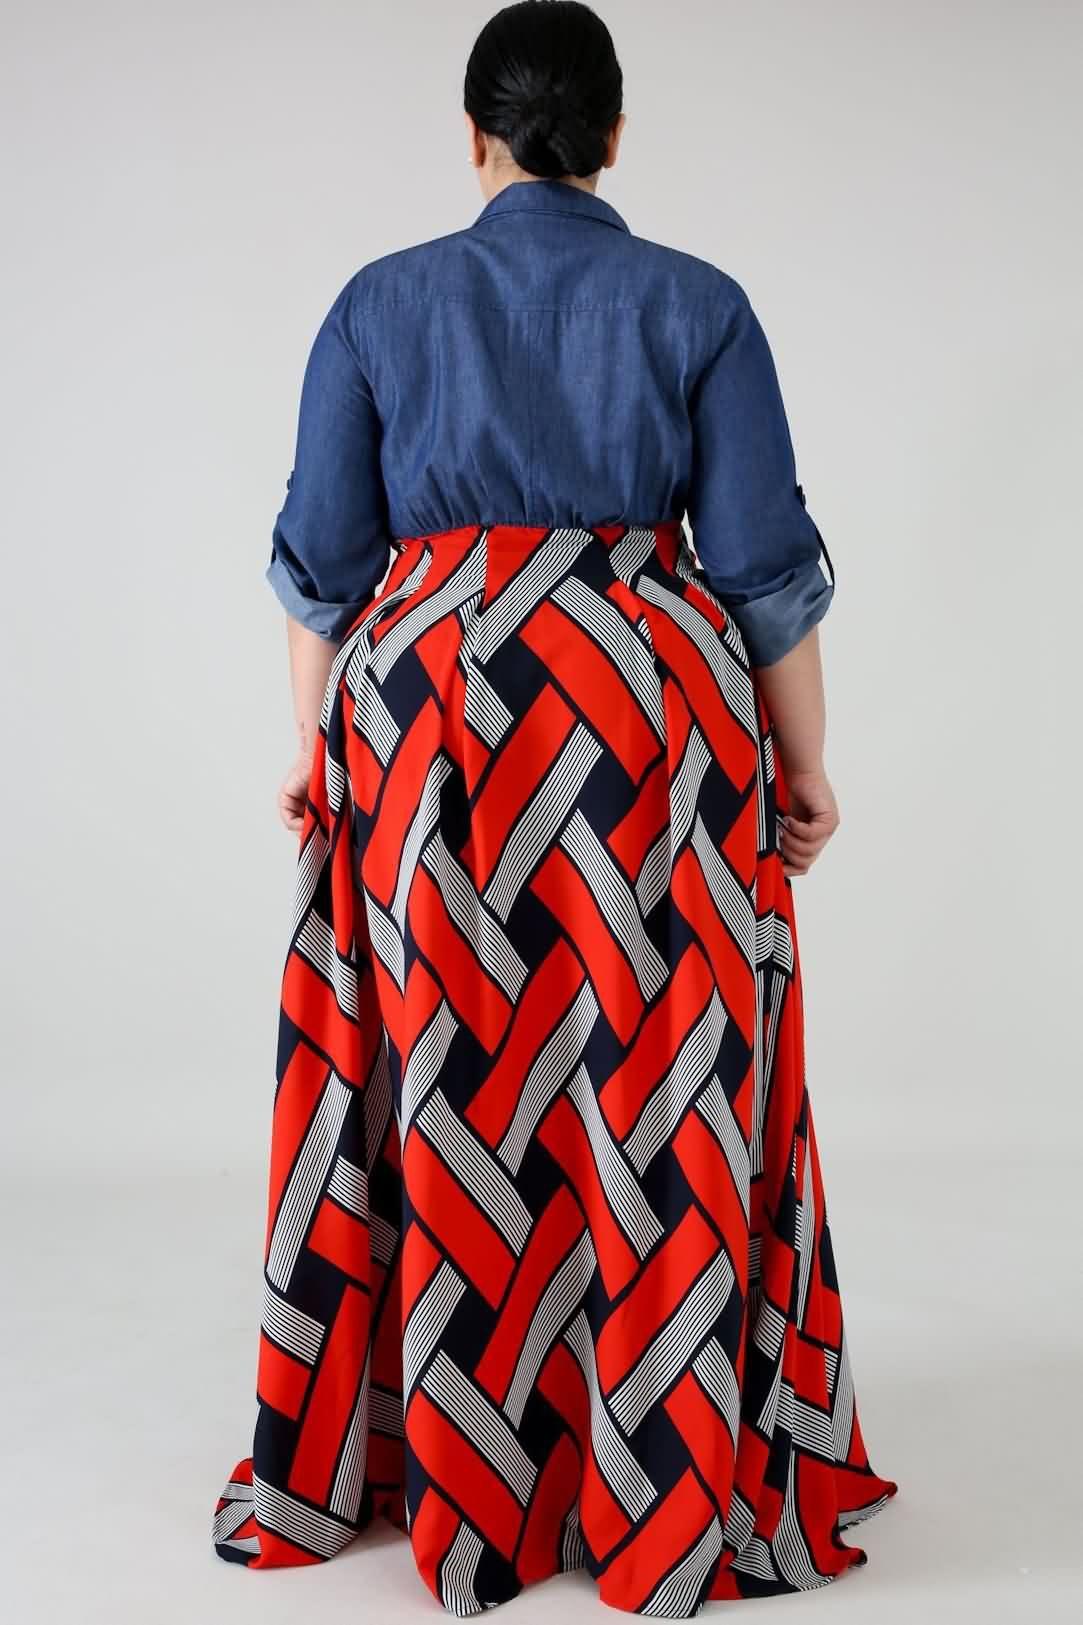 3da2eb84dda Women Red Tribal Print Button Up Casual Plus Size Maxi Shirt Dress - 3XL